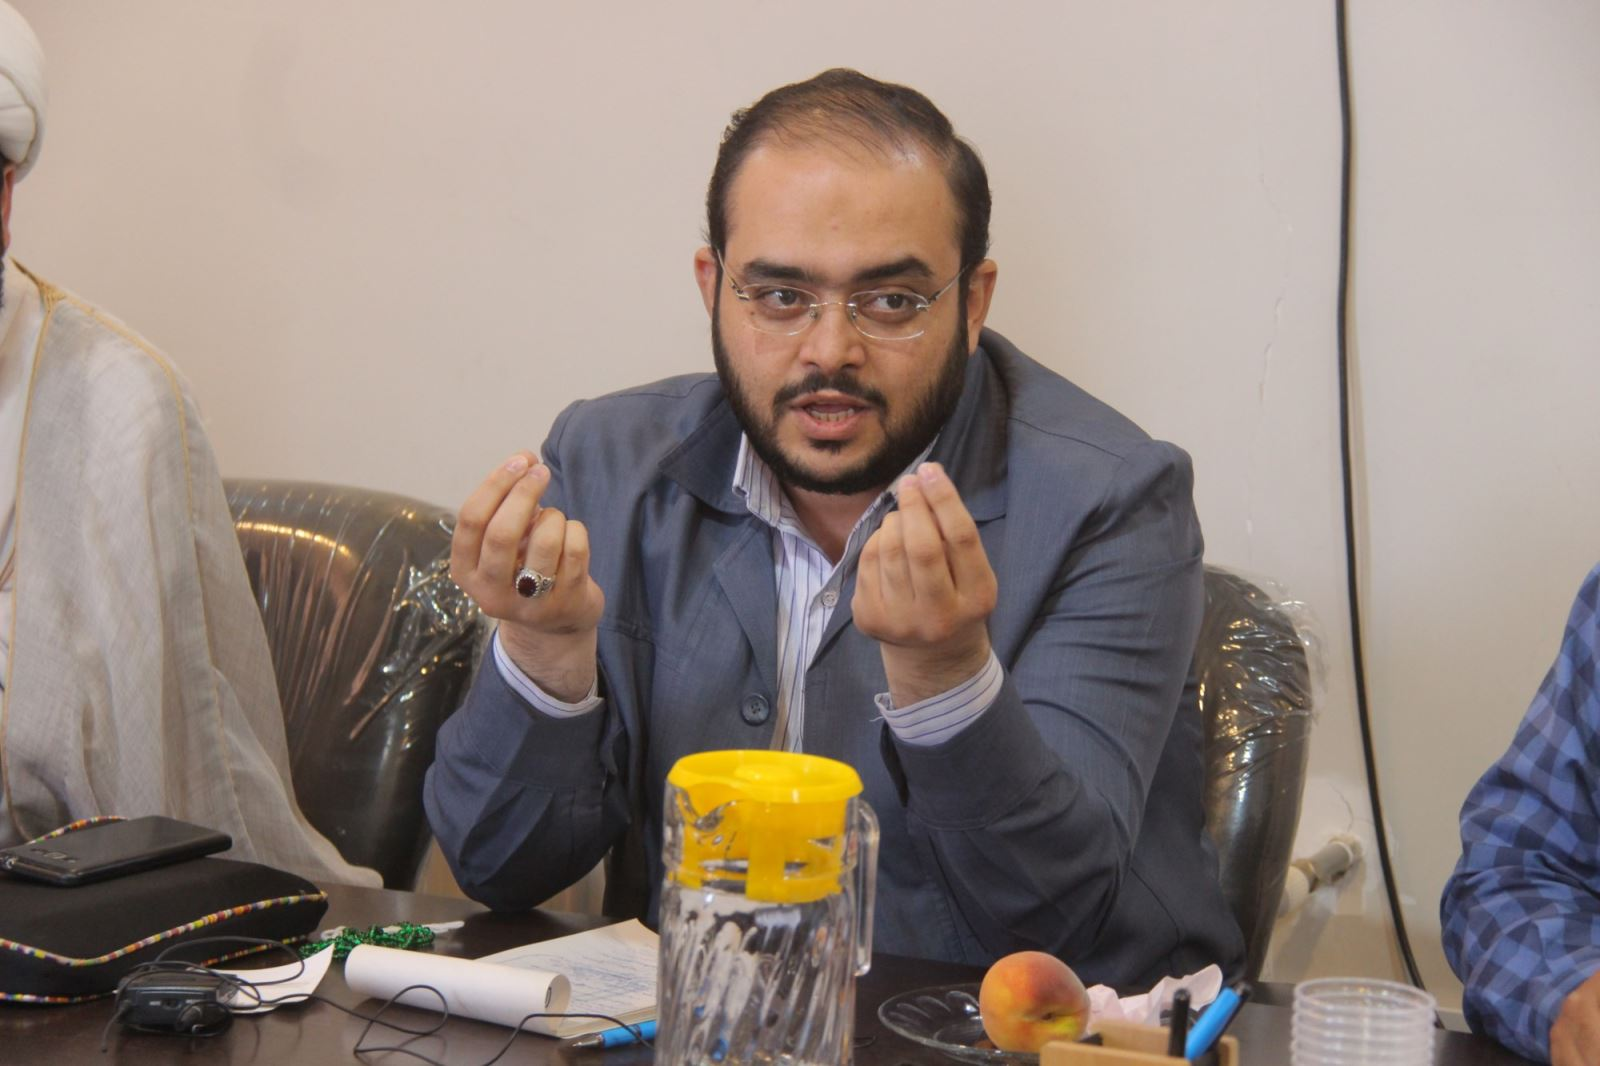 عباسعلی متولیان دبیر انجمن سواد رسانه طلاب